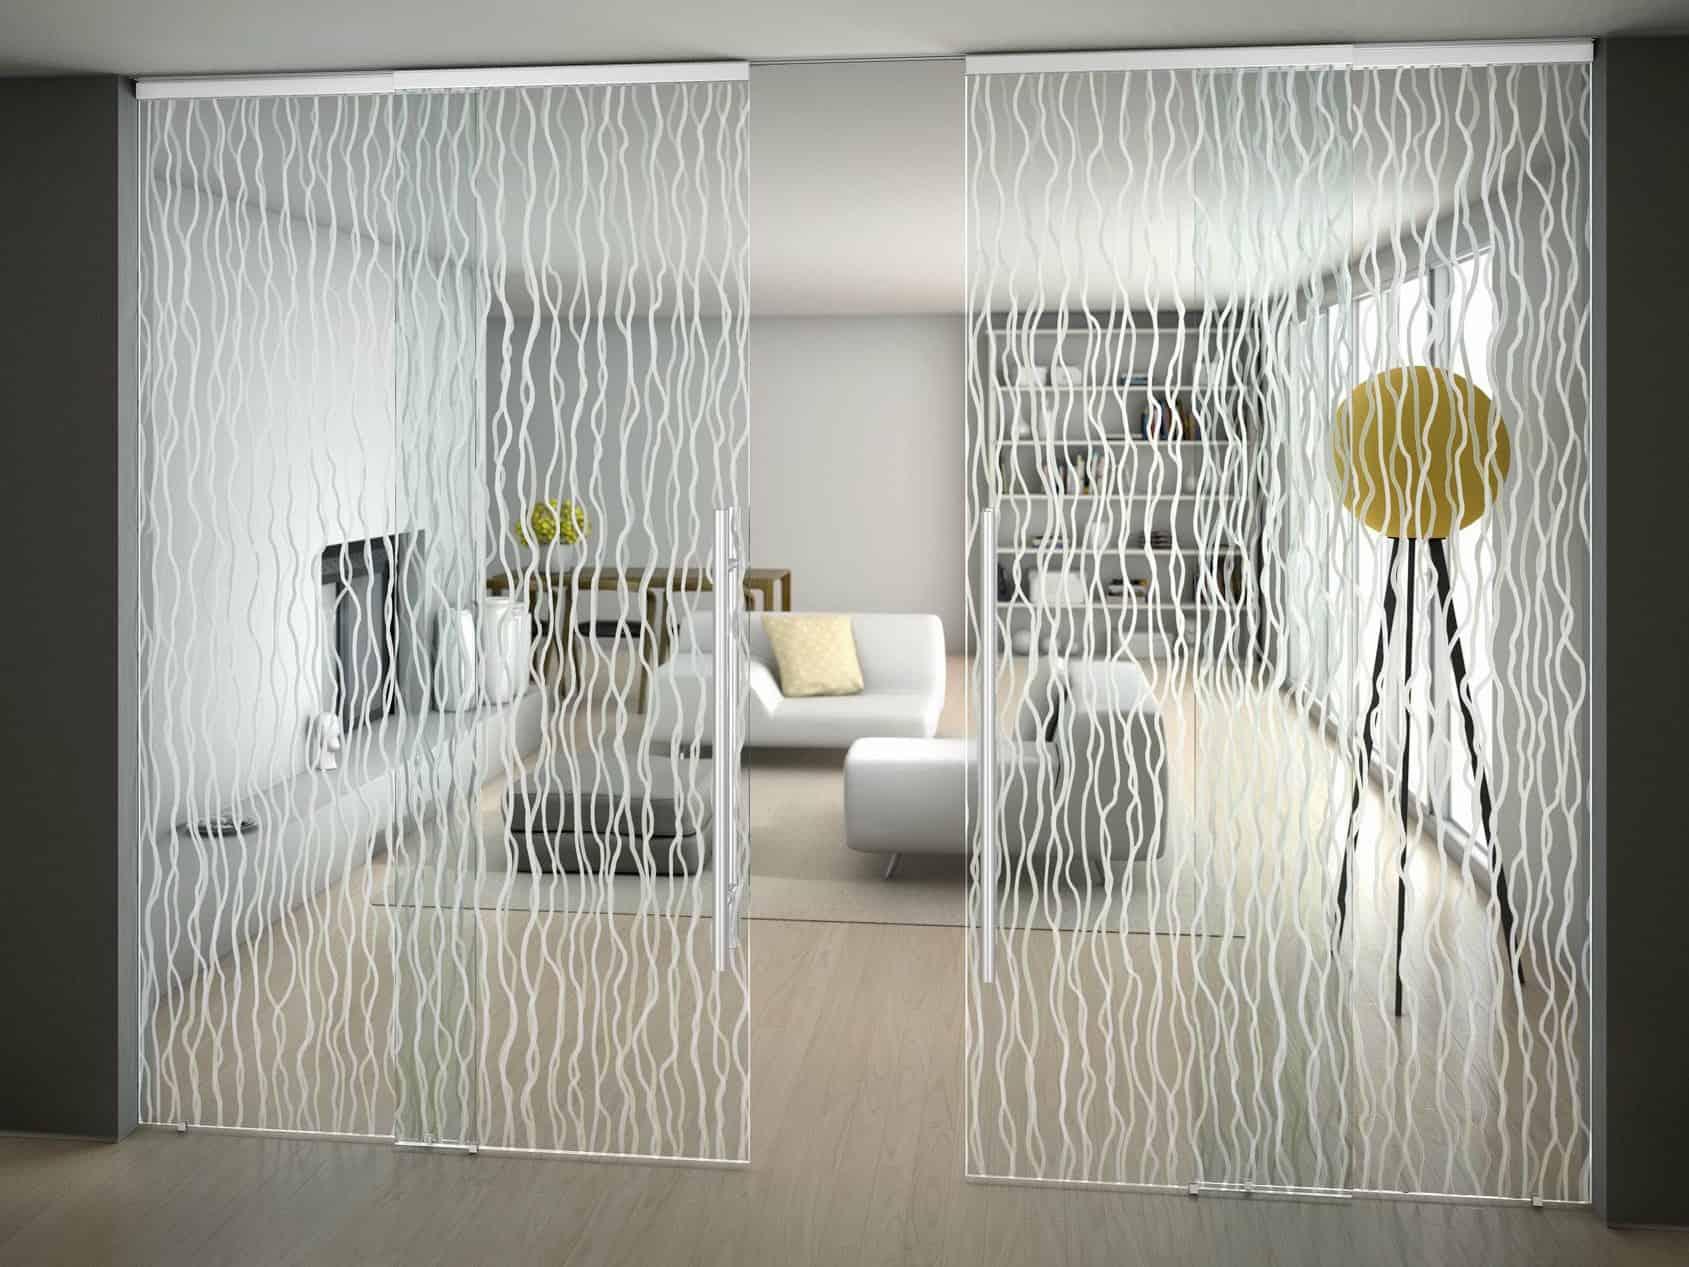 Suspended Art Glass Doors: Sinthesy by FOA